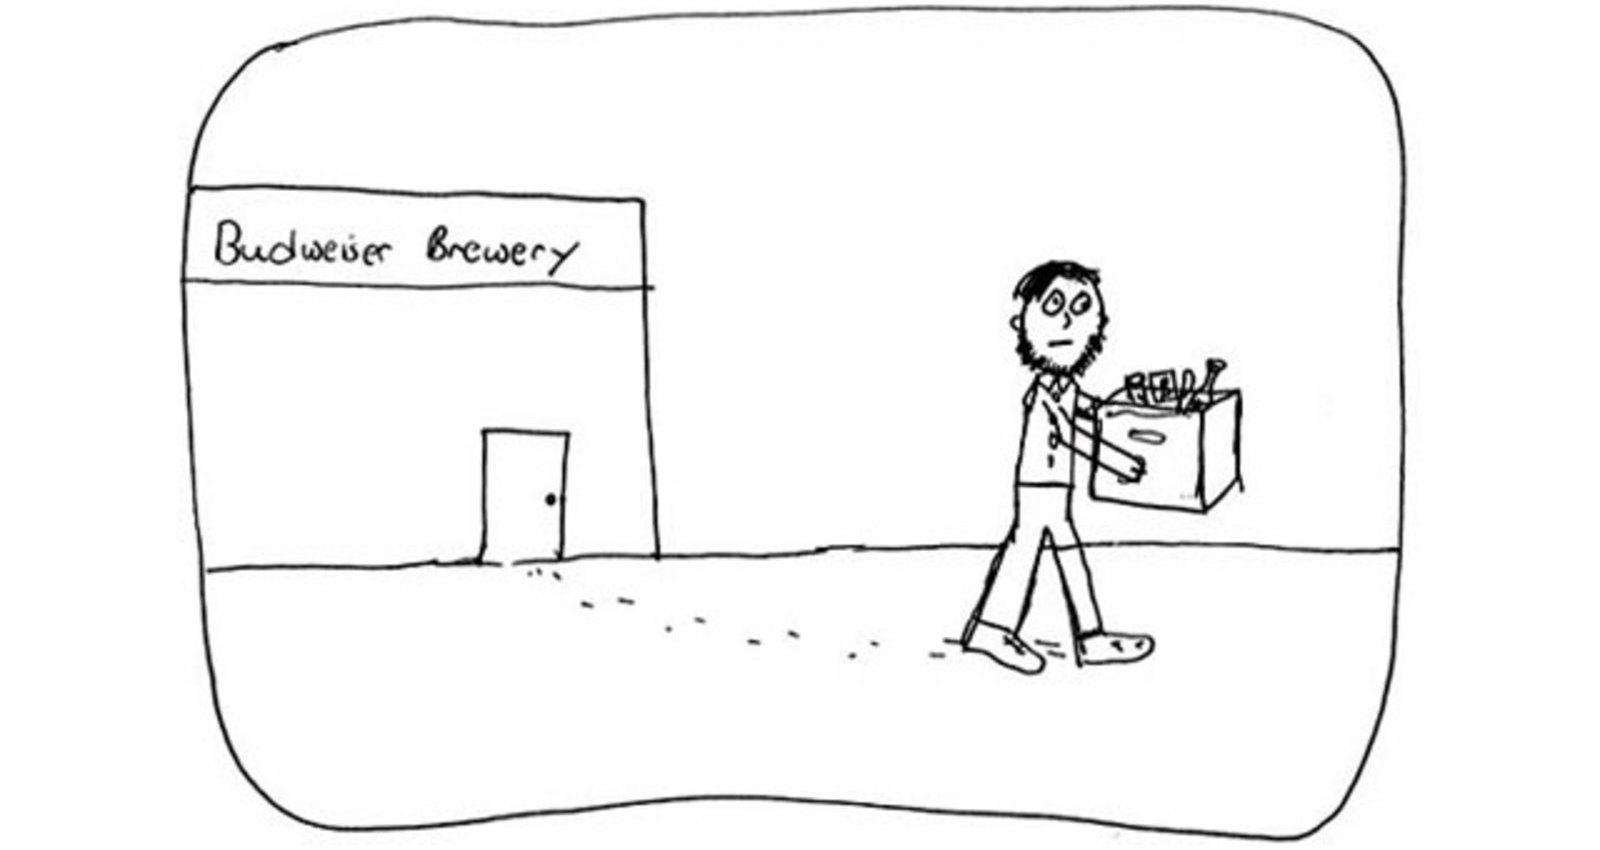 Brewmaster, Minimaids, Mark's Idea